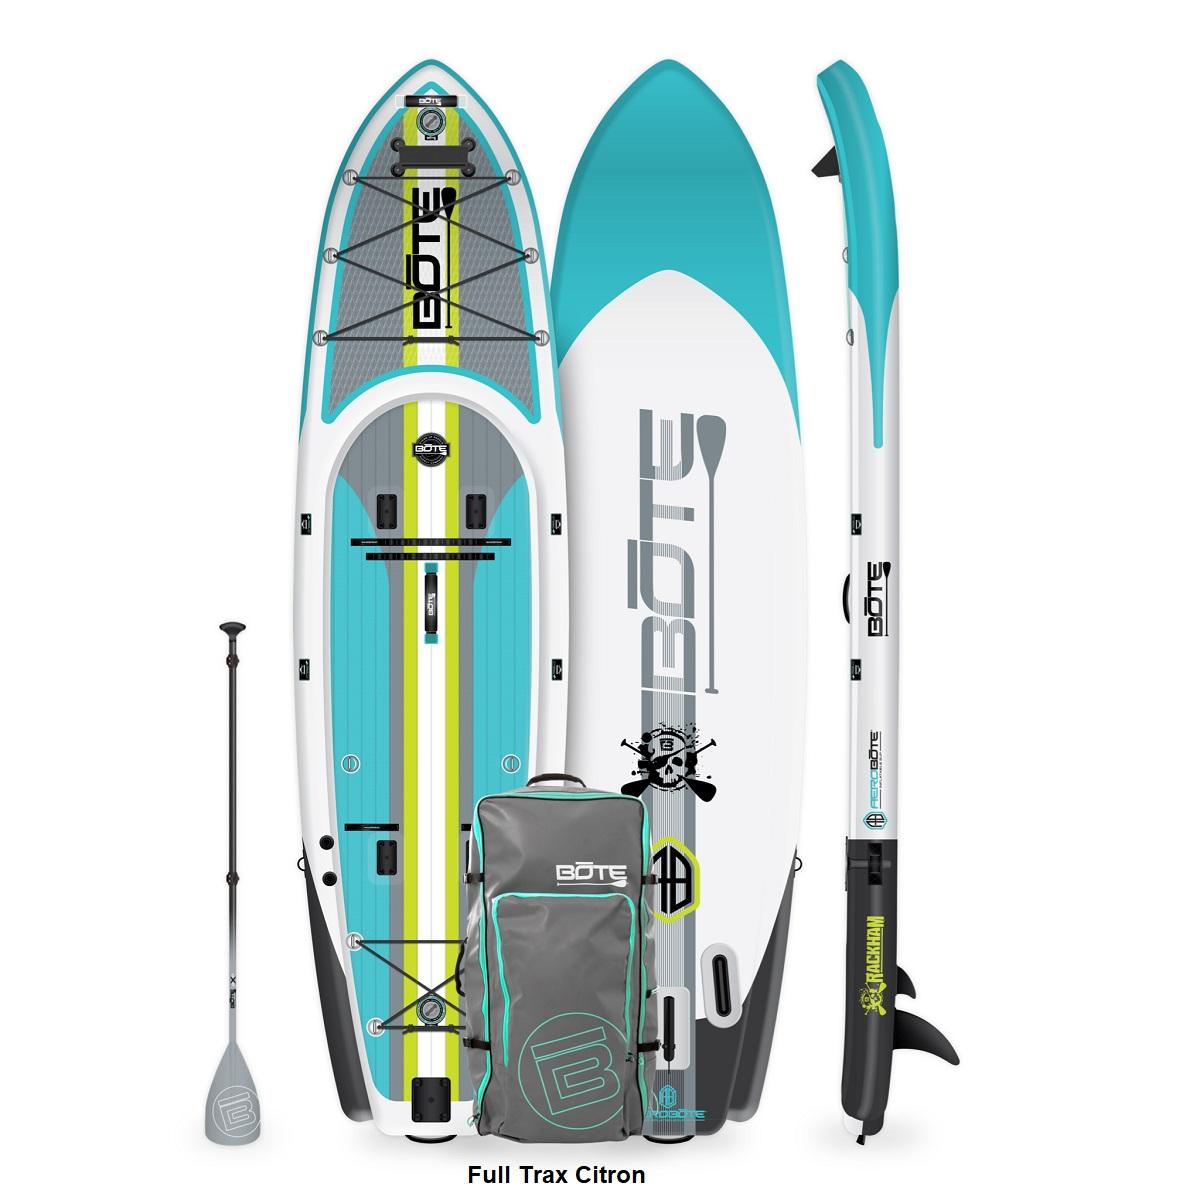 BOTE Rackham Aero Inflatable Paddle Board- Full Trax Citron